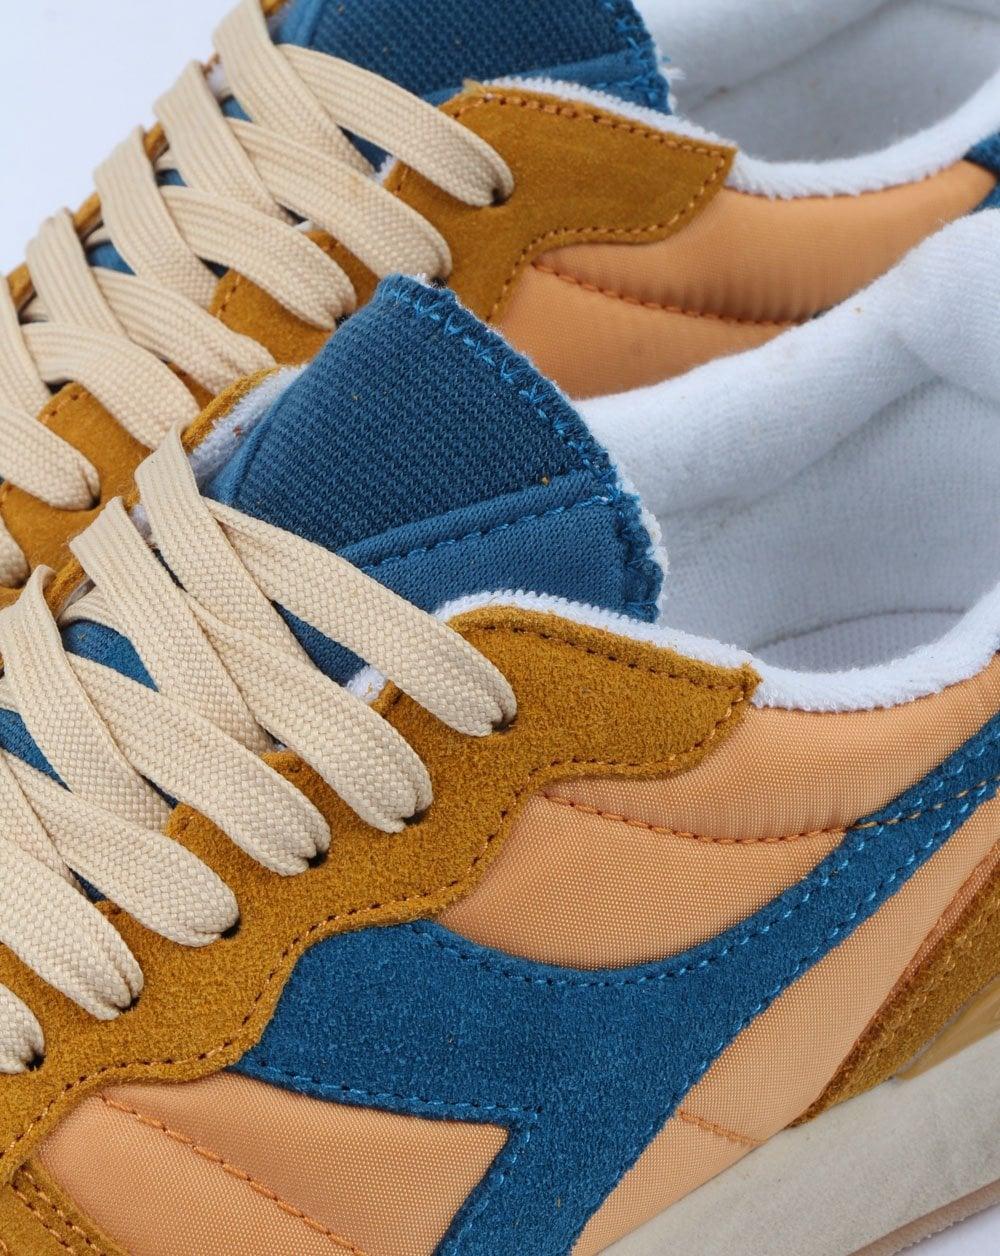 Diadora Camaro Trainers in Orange Mustard /& Blue vintage used distressed look